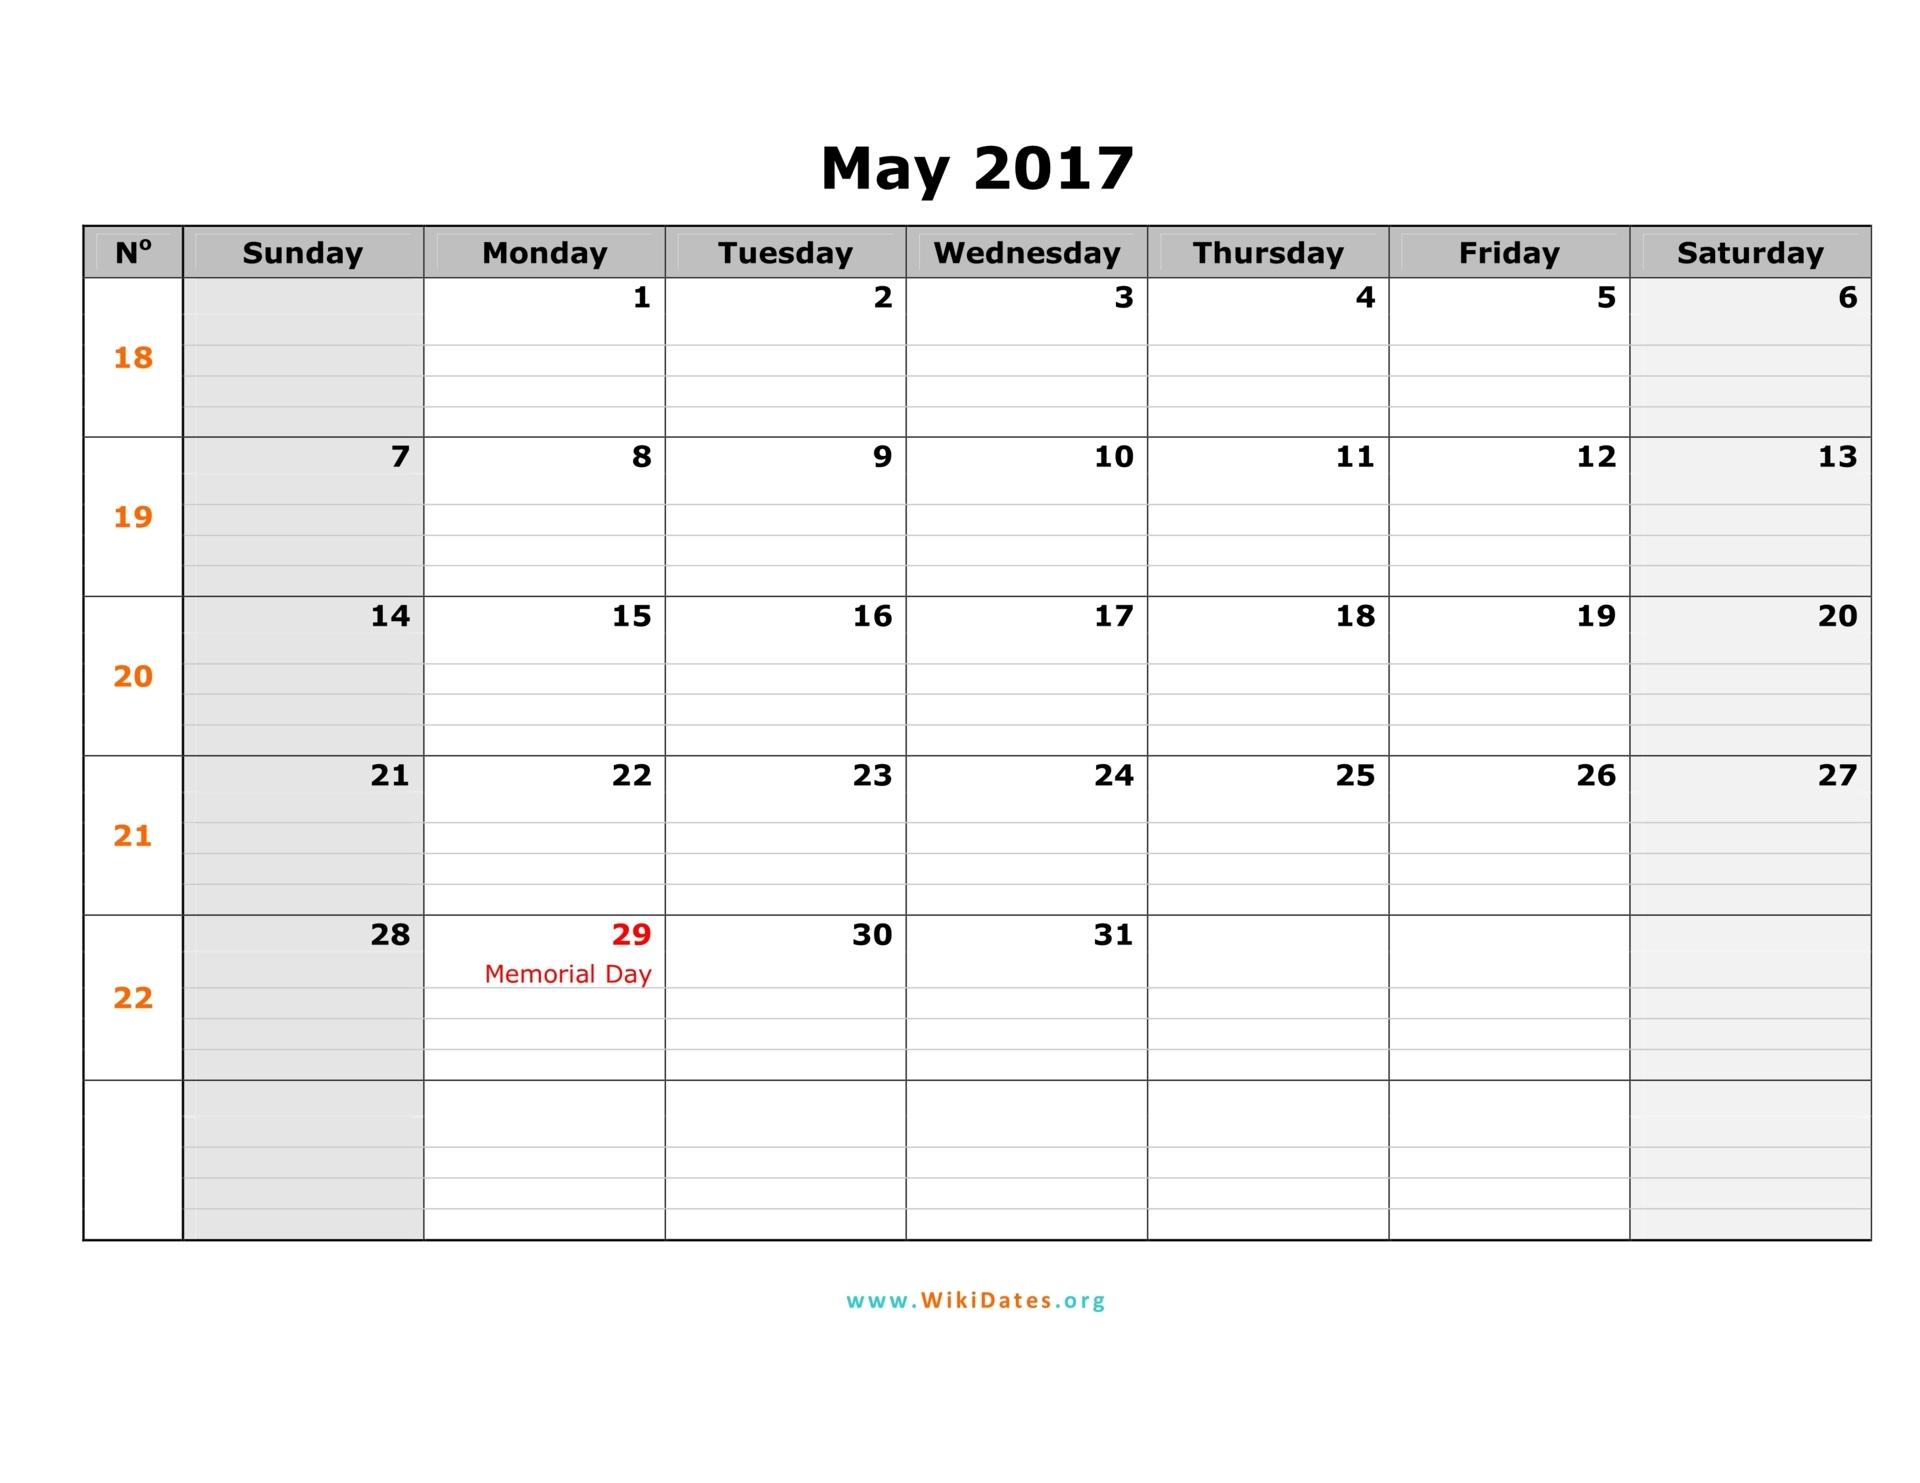 May 2017 Calendar | WikiDates.org